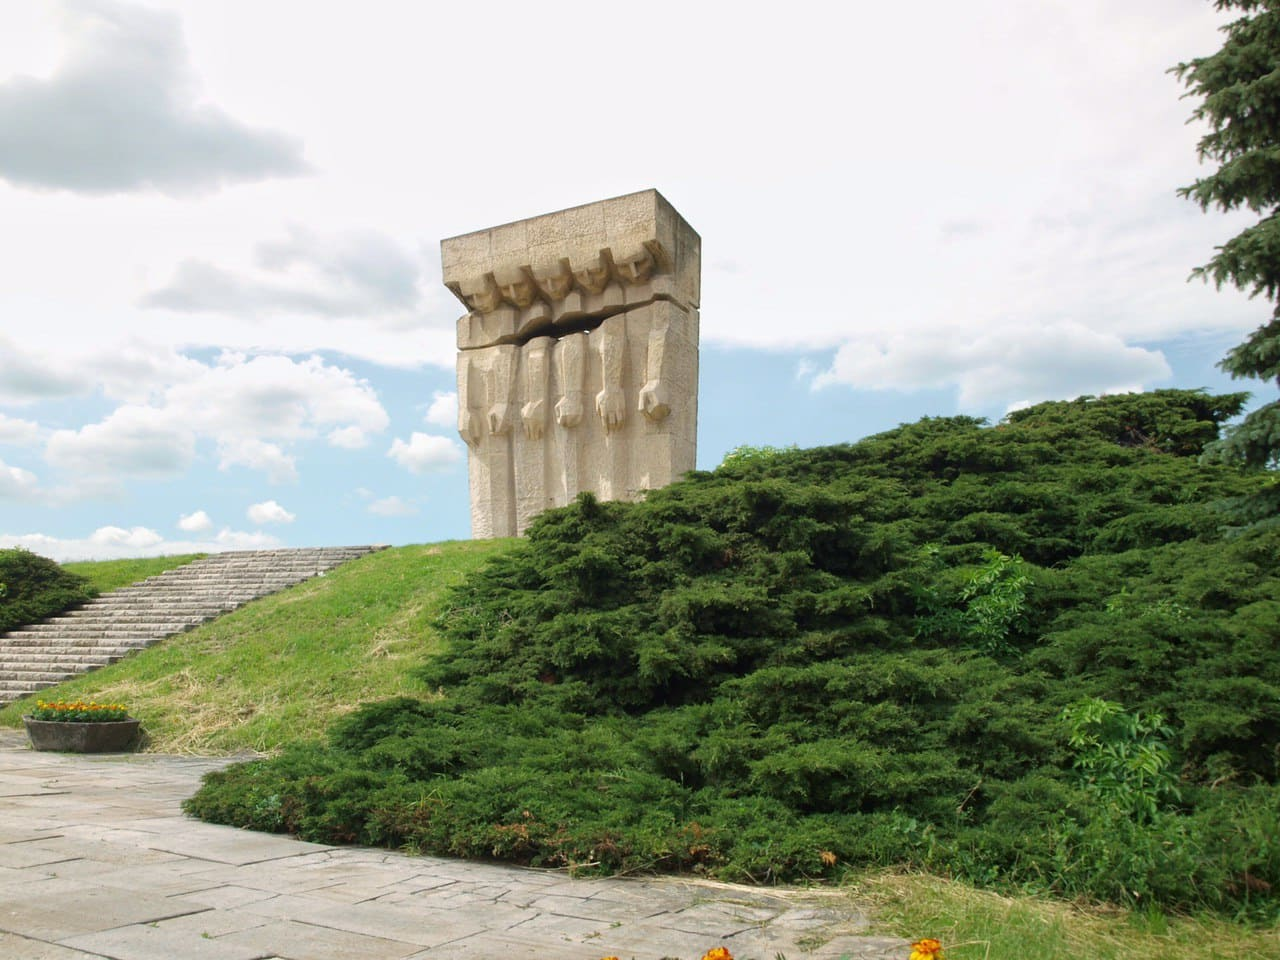 Visit major city attractions